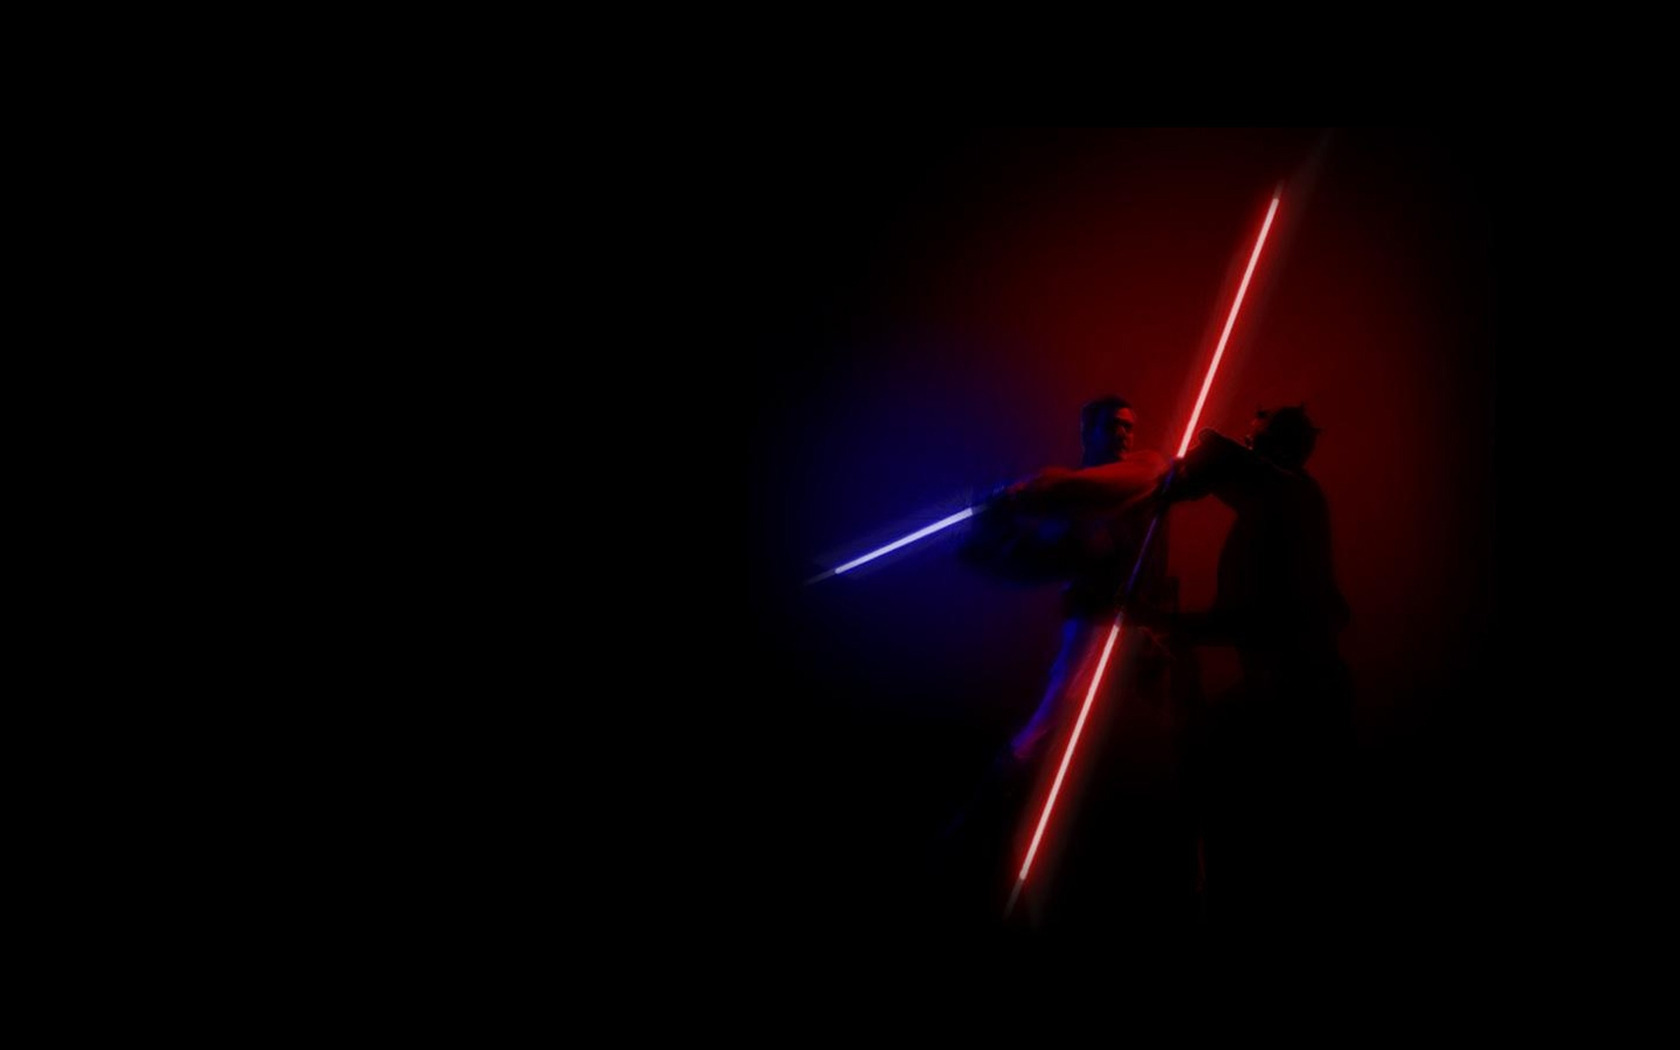 Pictures Star Wars Darth Maul Obi Wan Kenobi Lightsabers 1680x1050 Download Resolutions Desktop